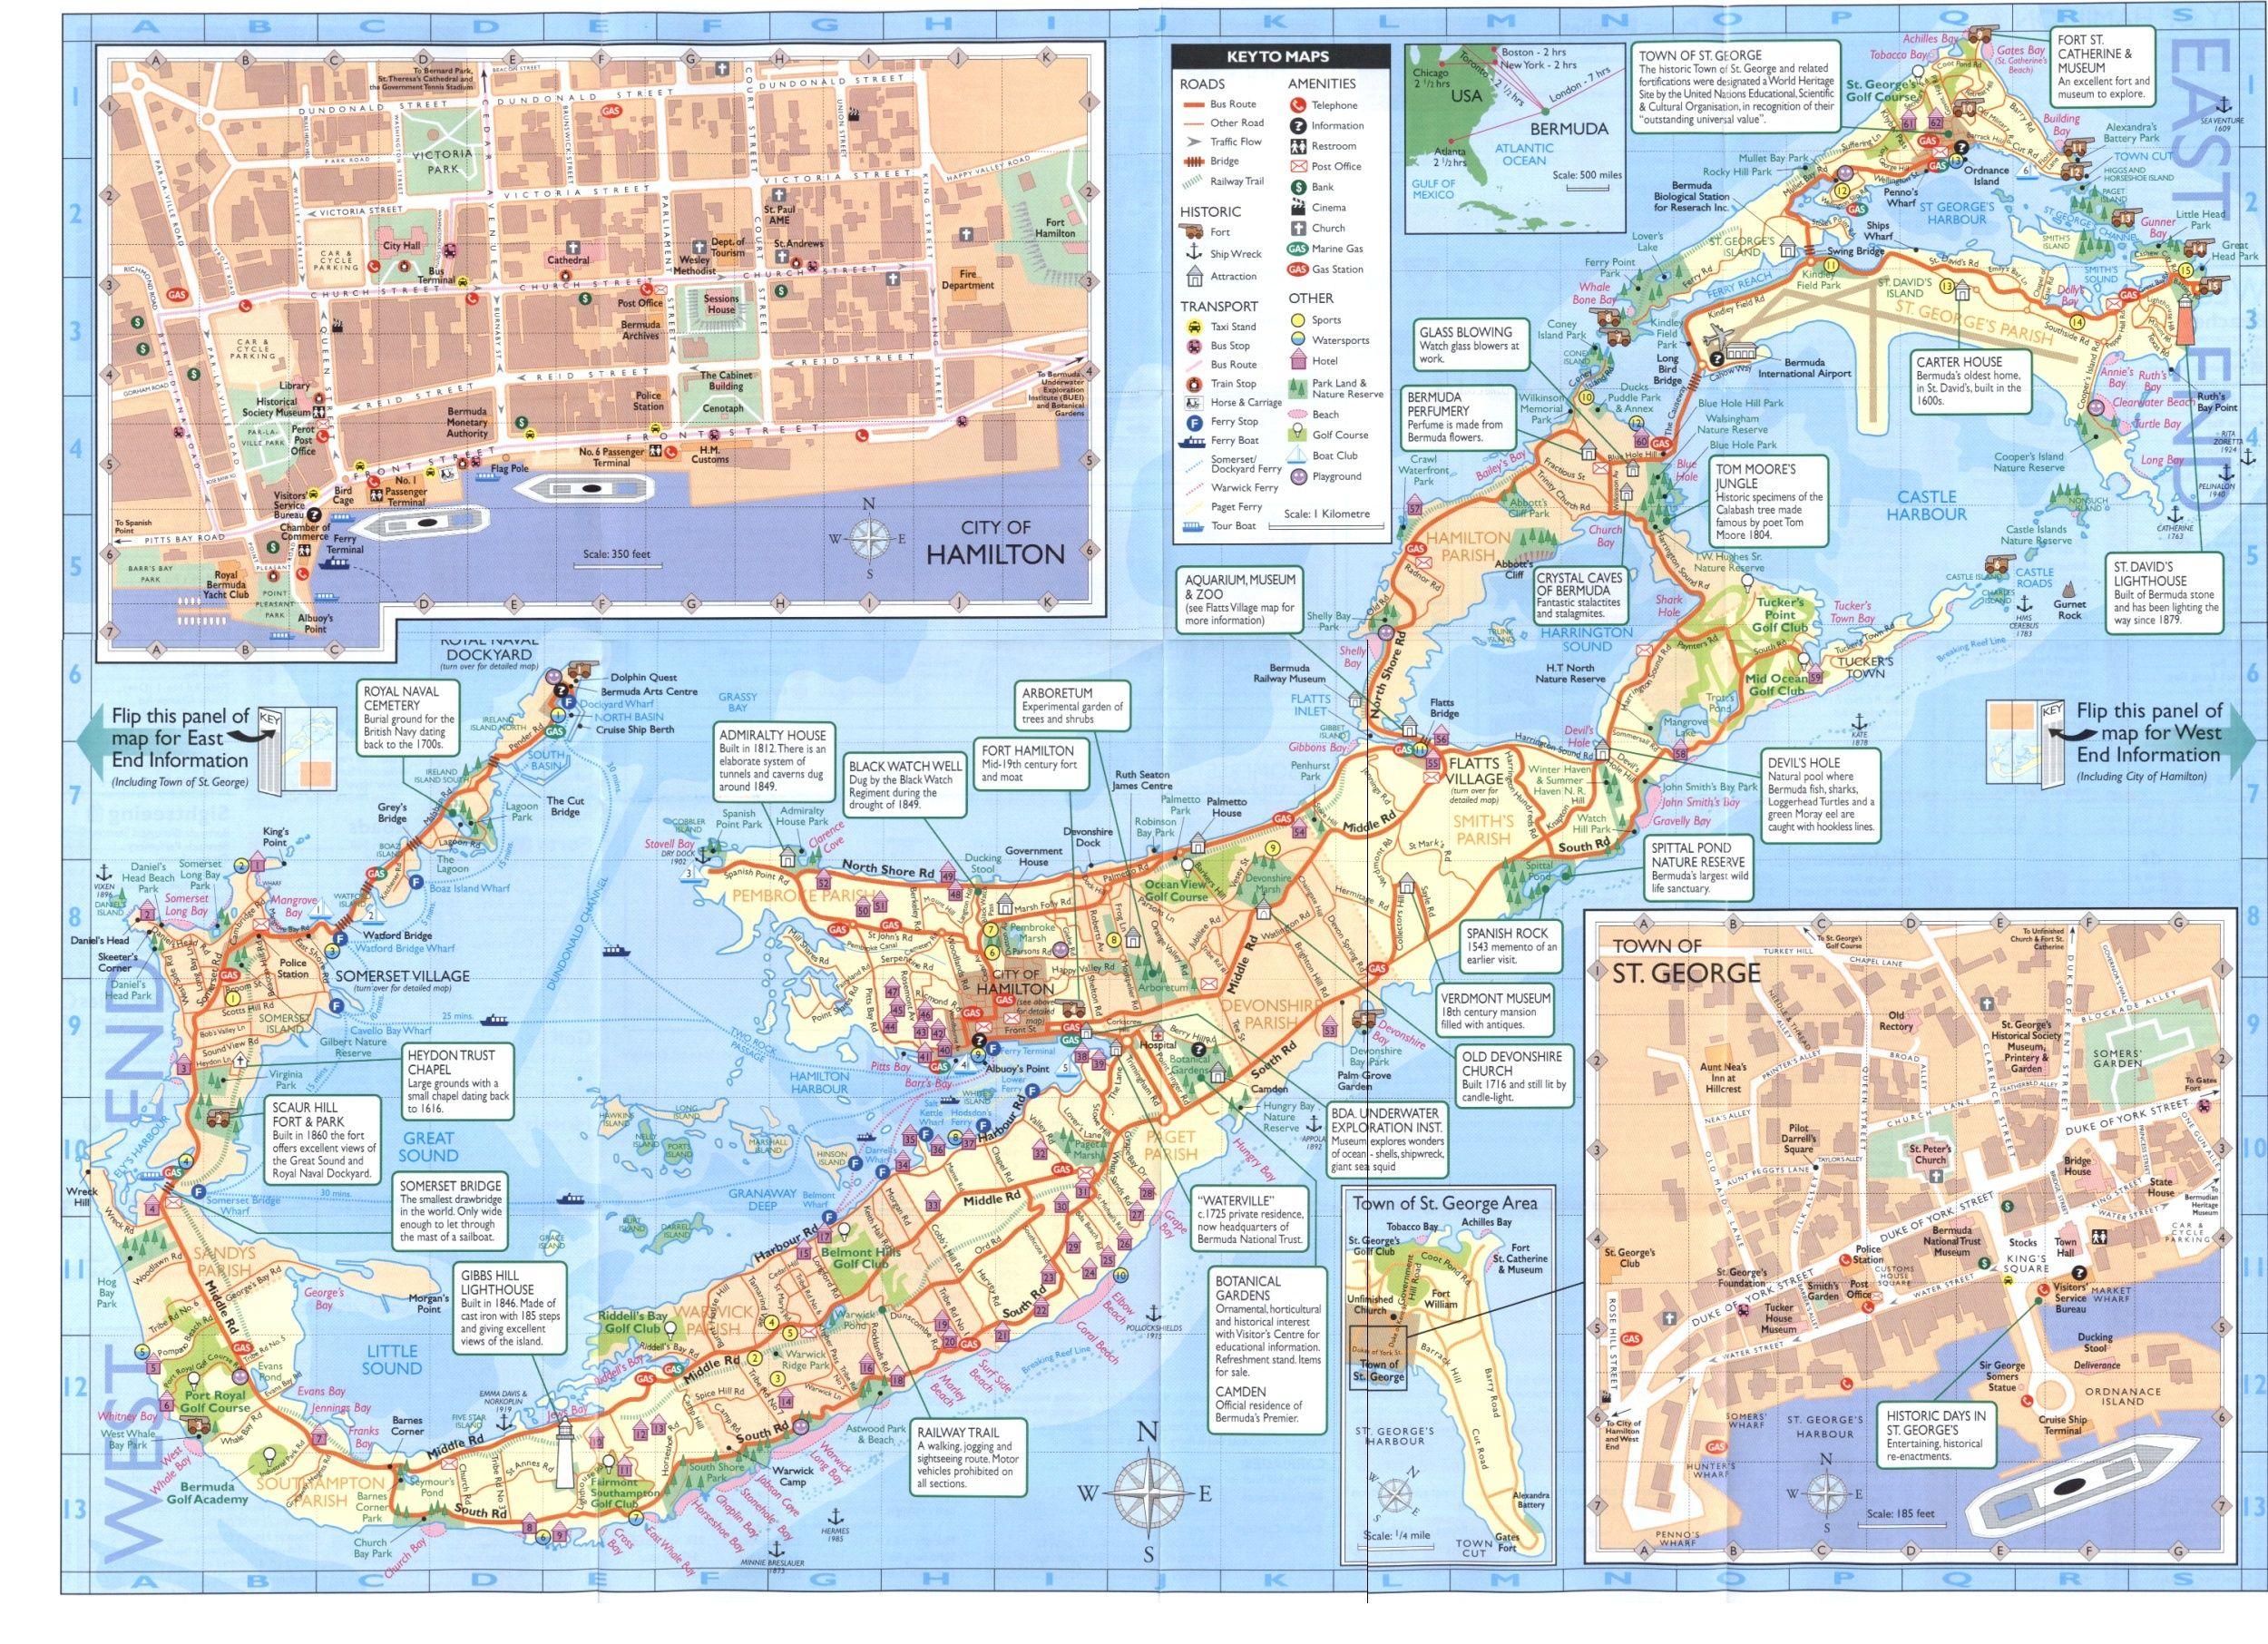 kings wharf bermuda map Bermuda Kings Wharf Activities Take A Great Vacation And Support kings wharf bermuda map